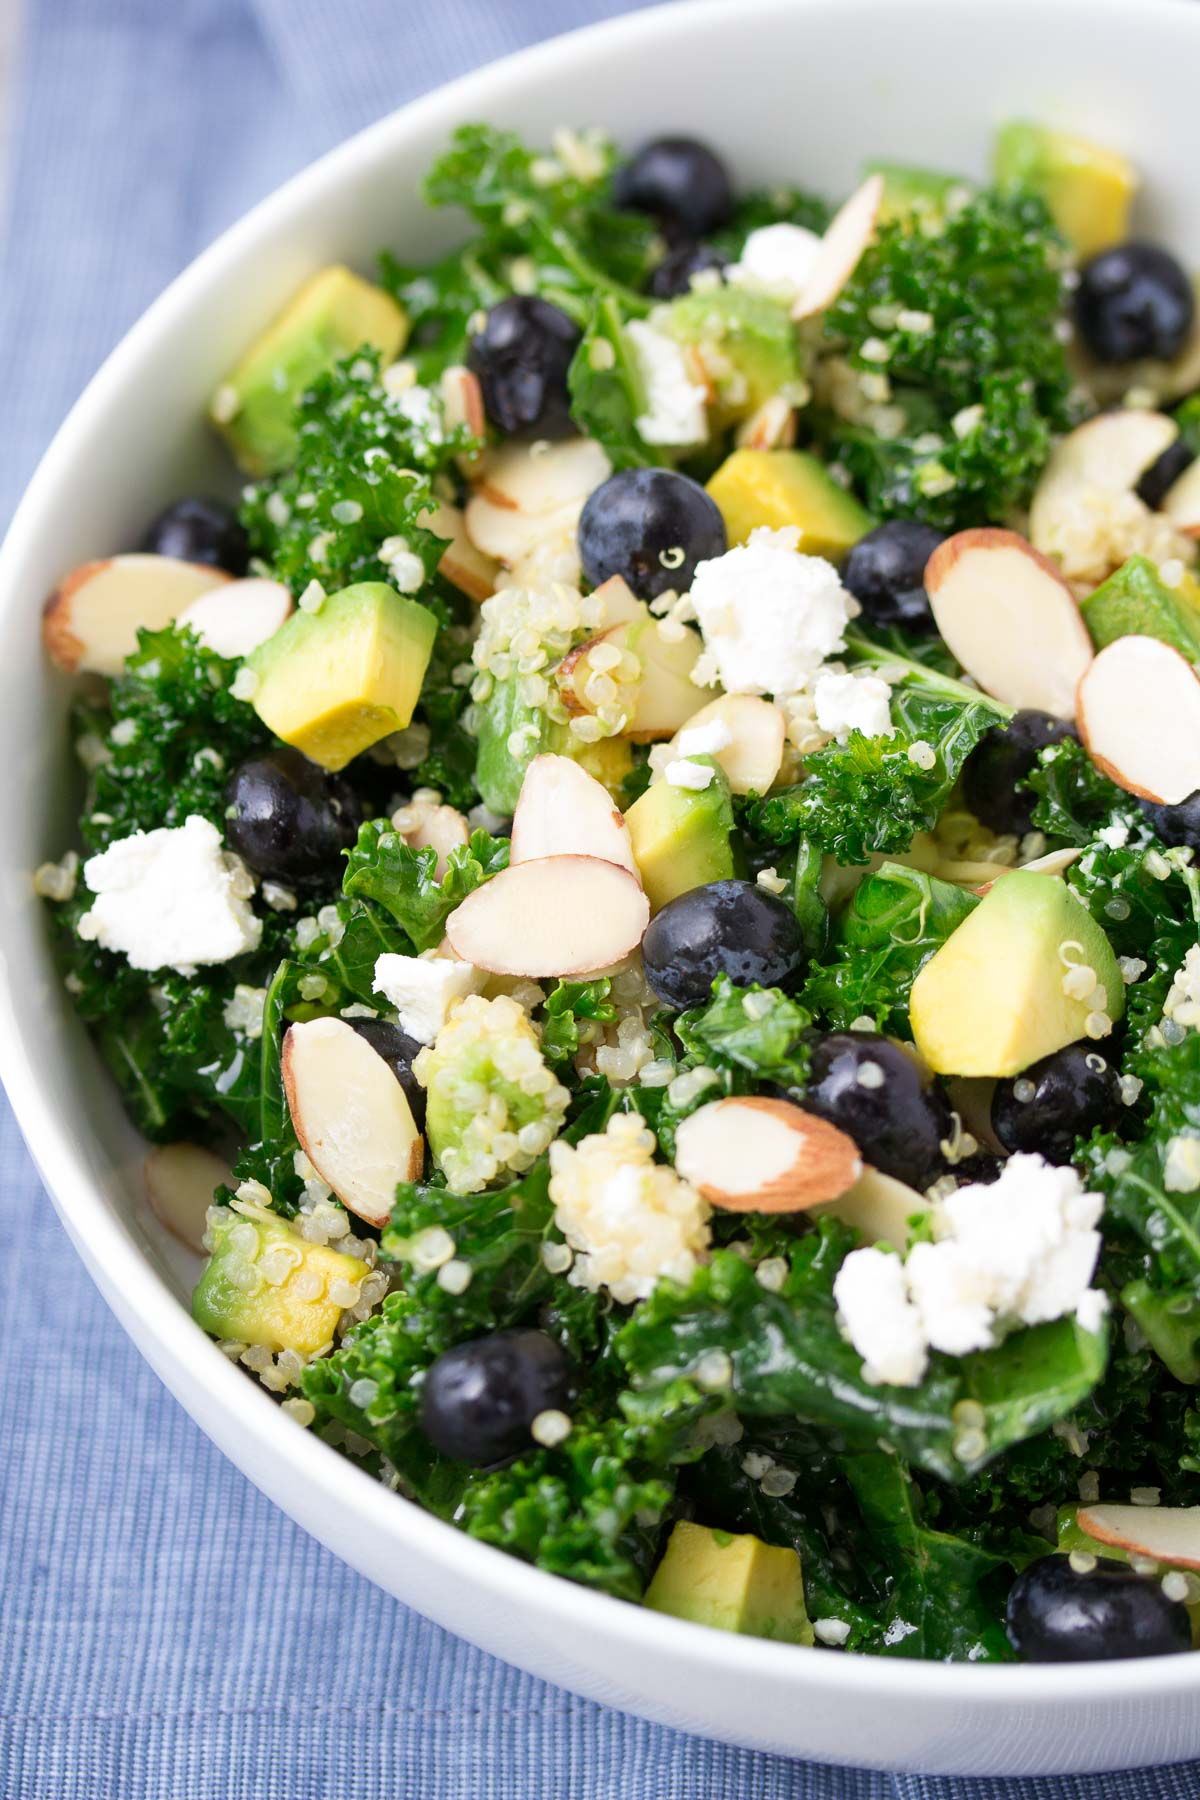 Is kale a super food